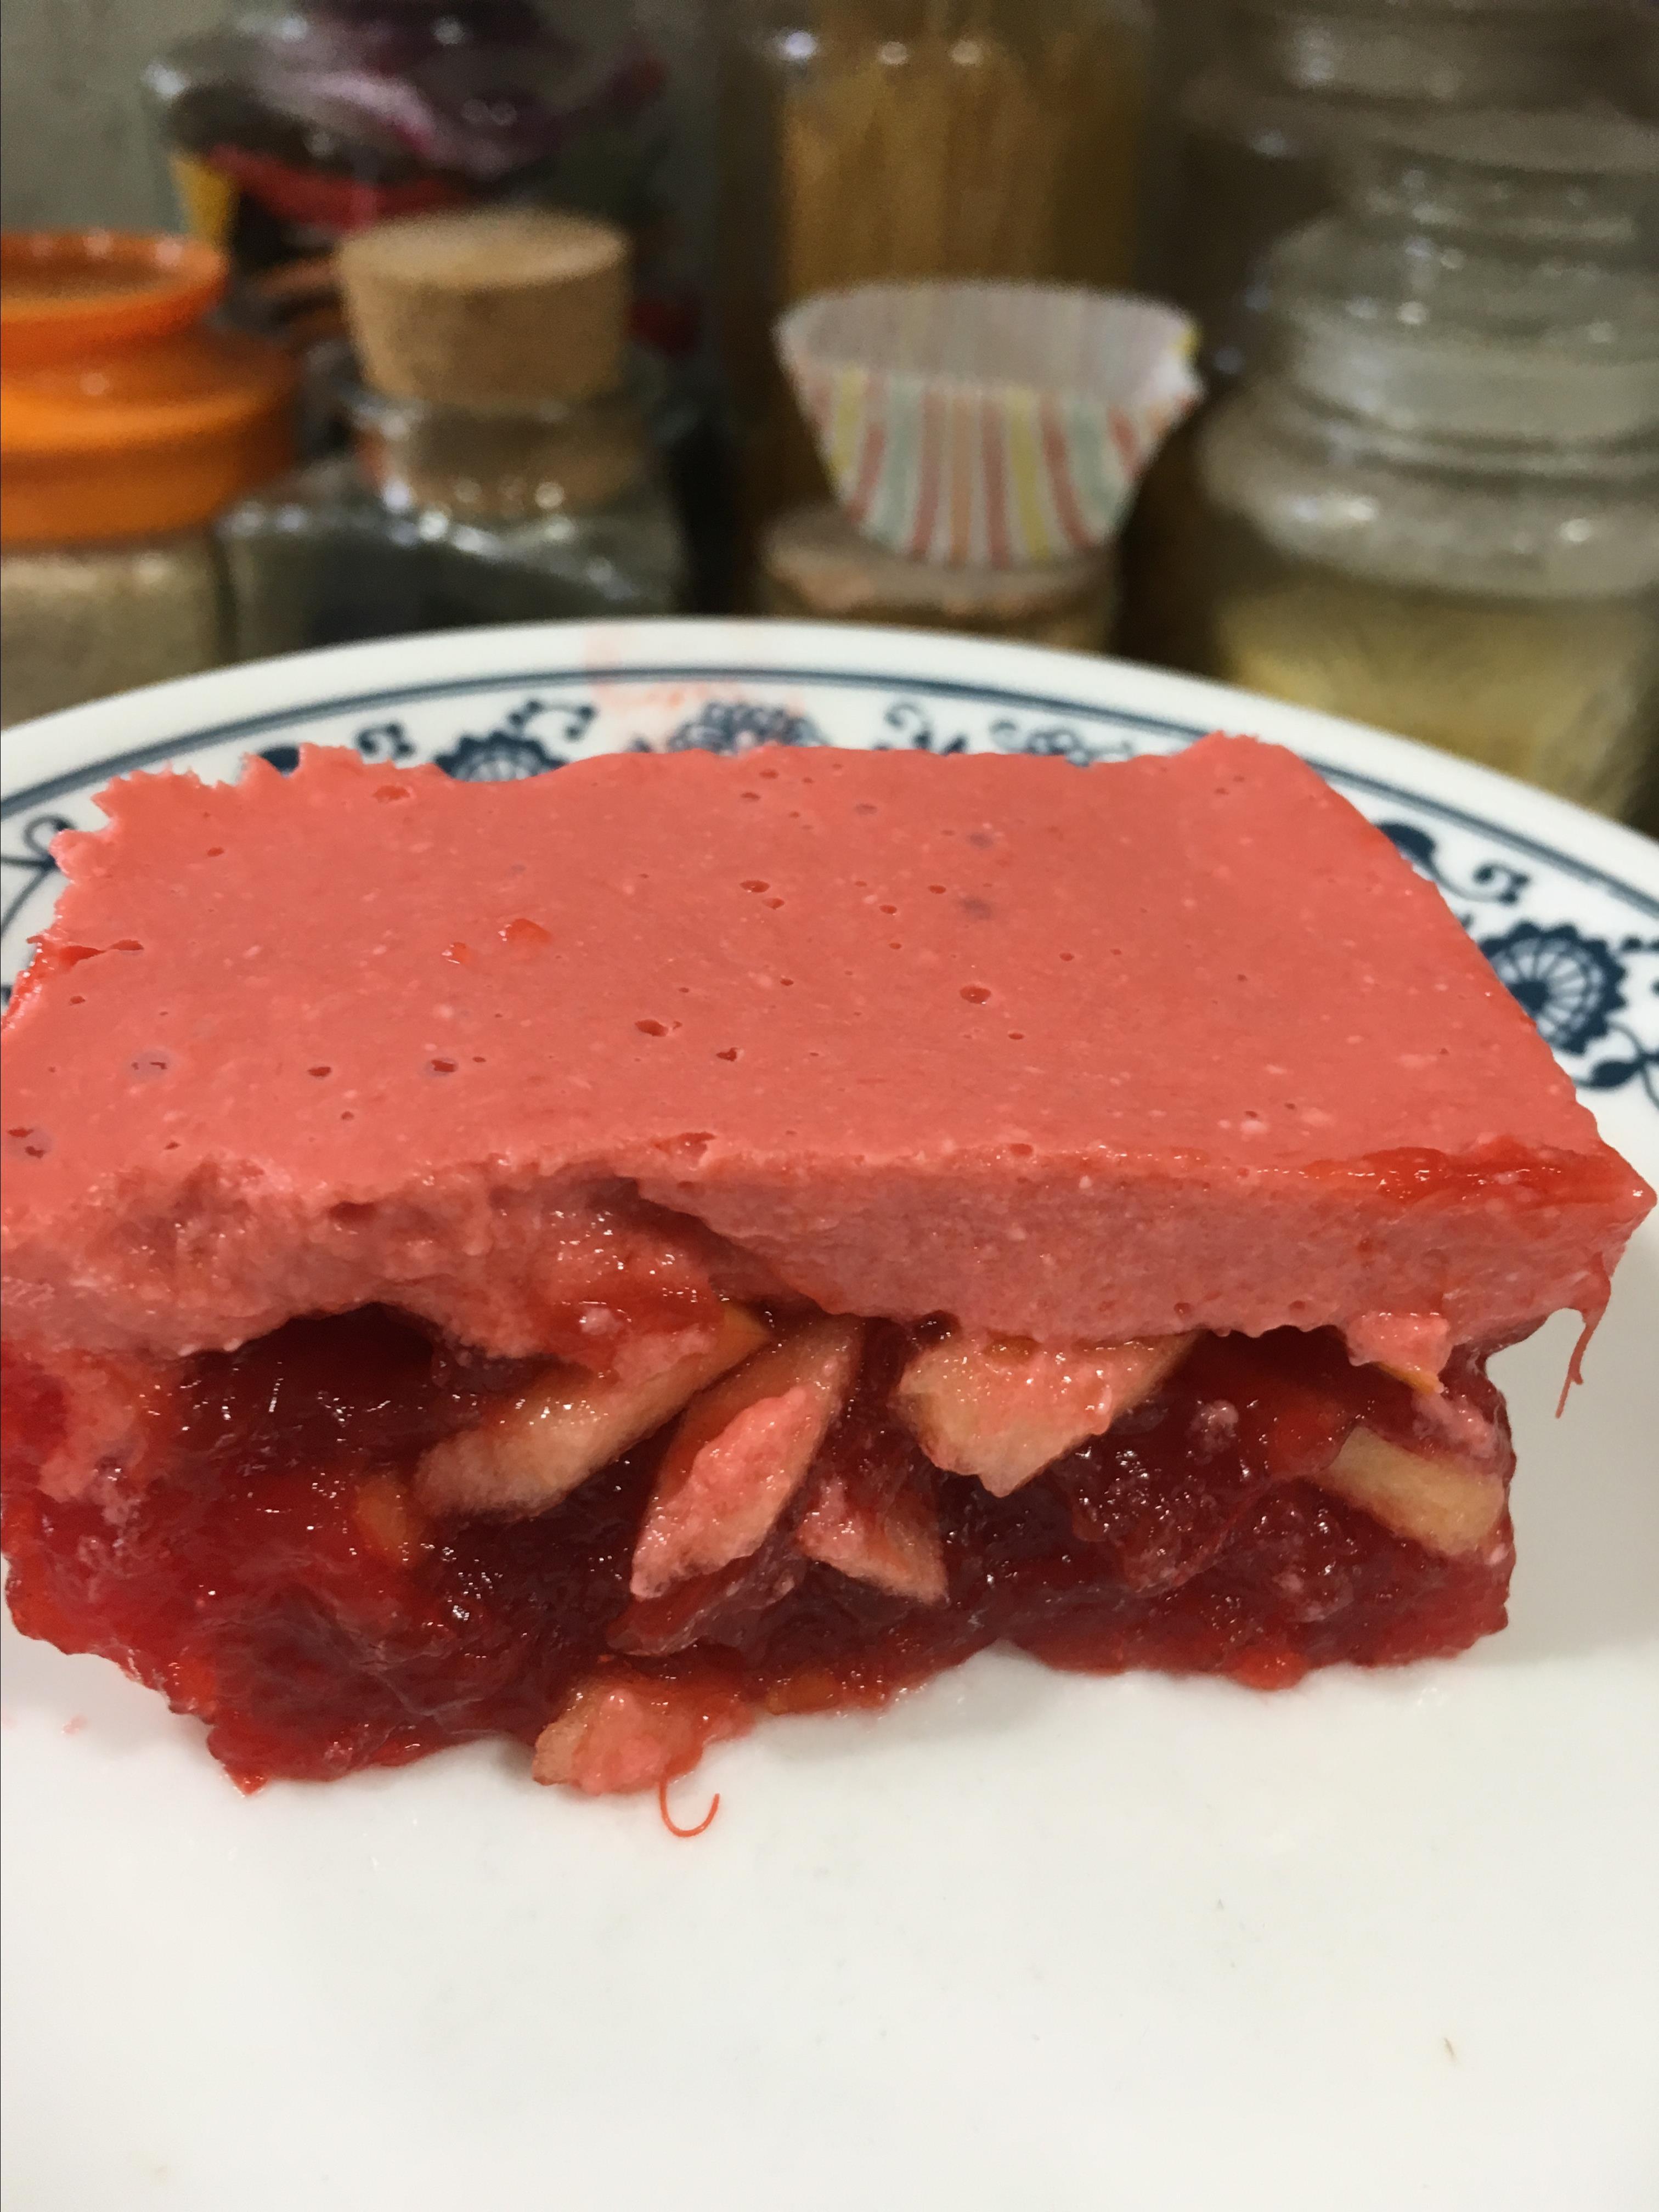 Rhubarb Gelatin Salad normal